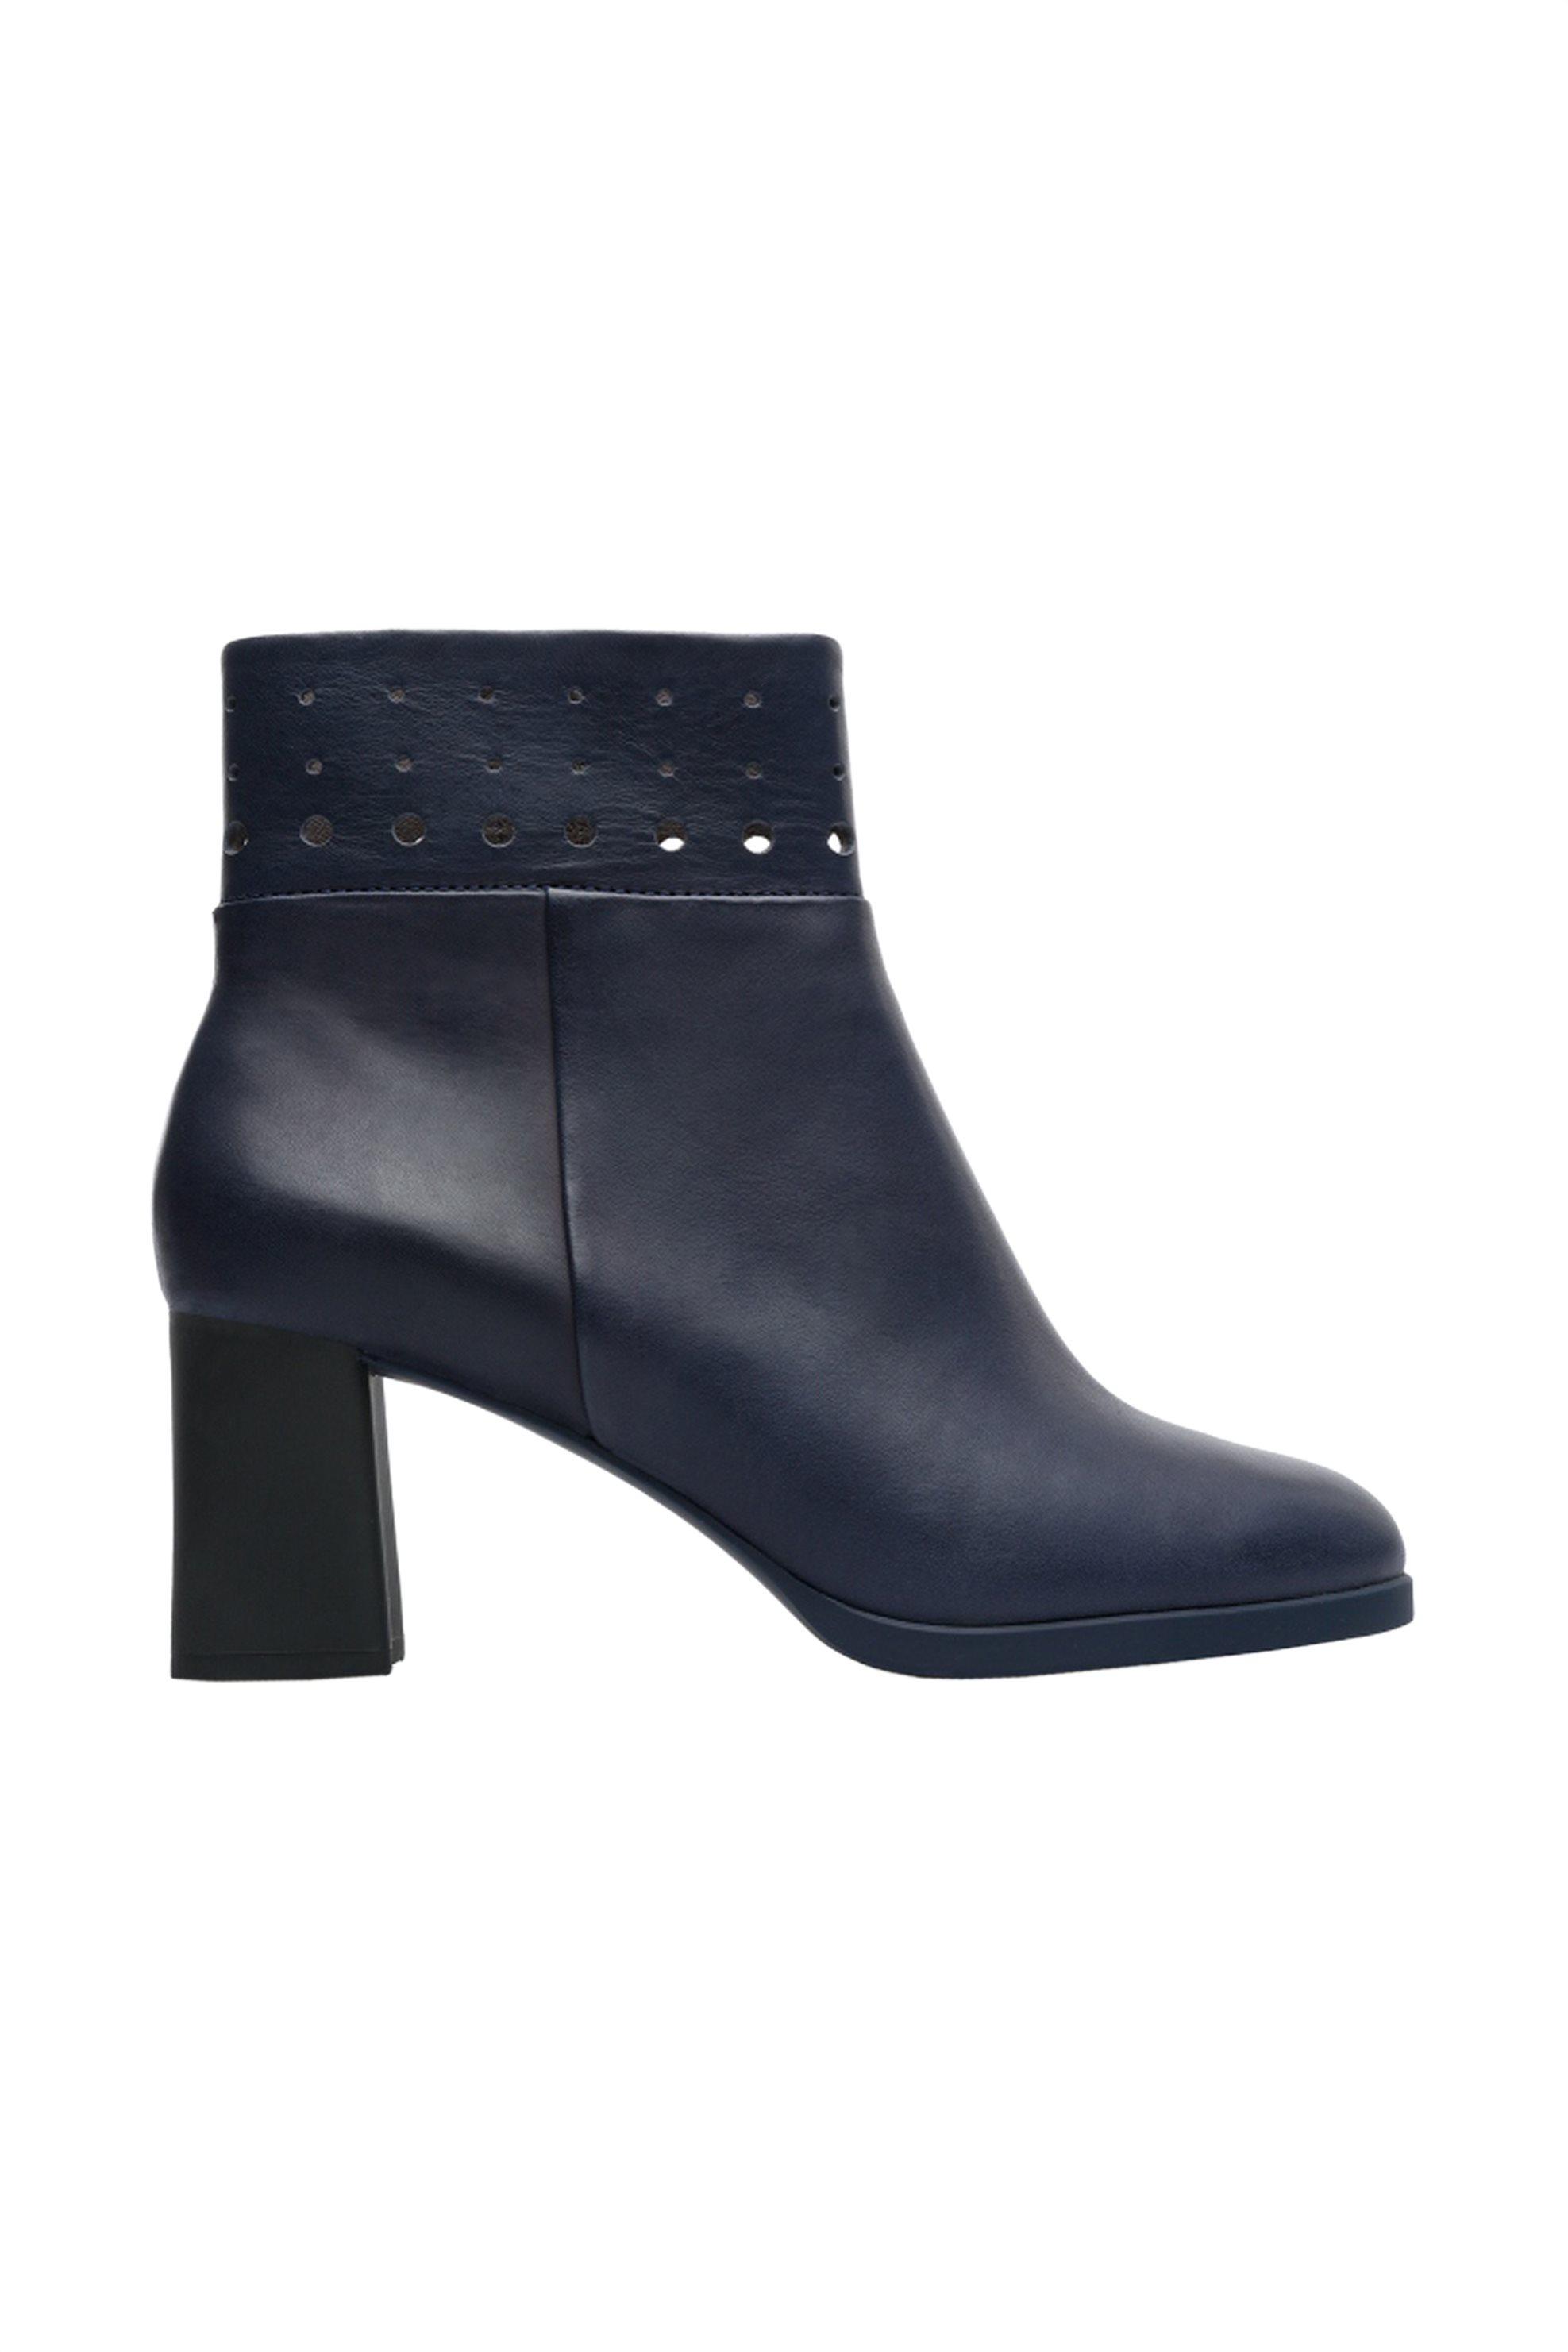 Camper γυναικεία μποτάκια με τακούνι Twins - K400346-002 - Μπλε Σκούρο γυναικα   παπουτσια   μποτάκια